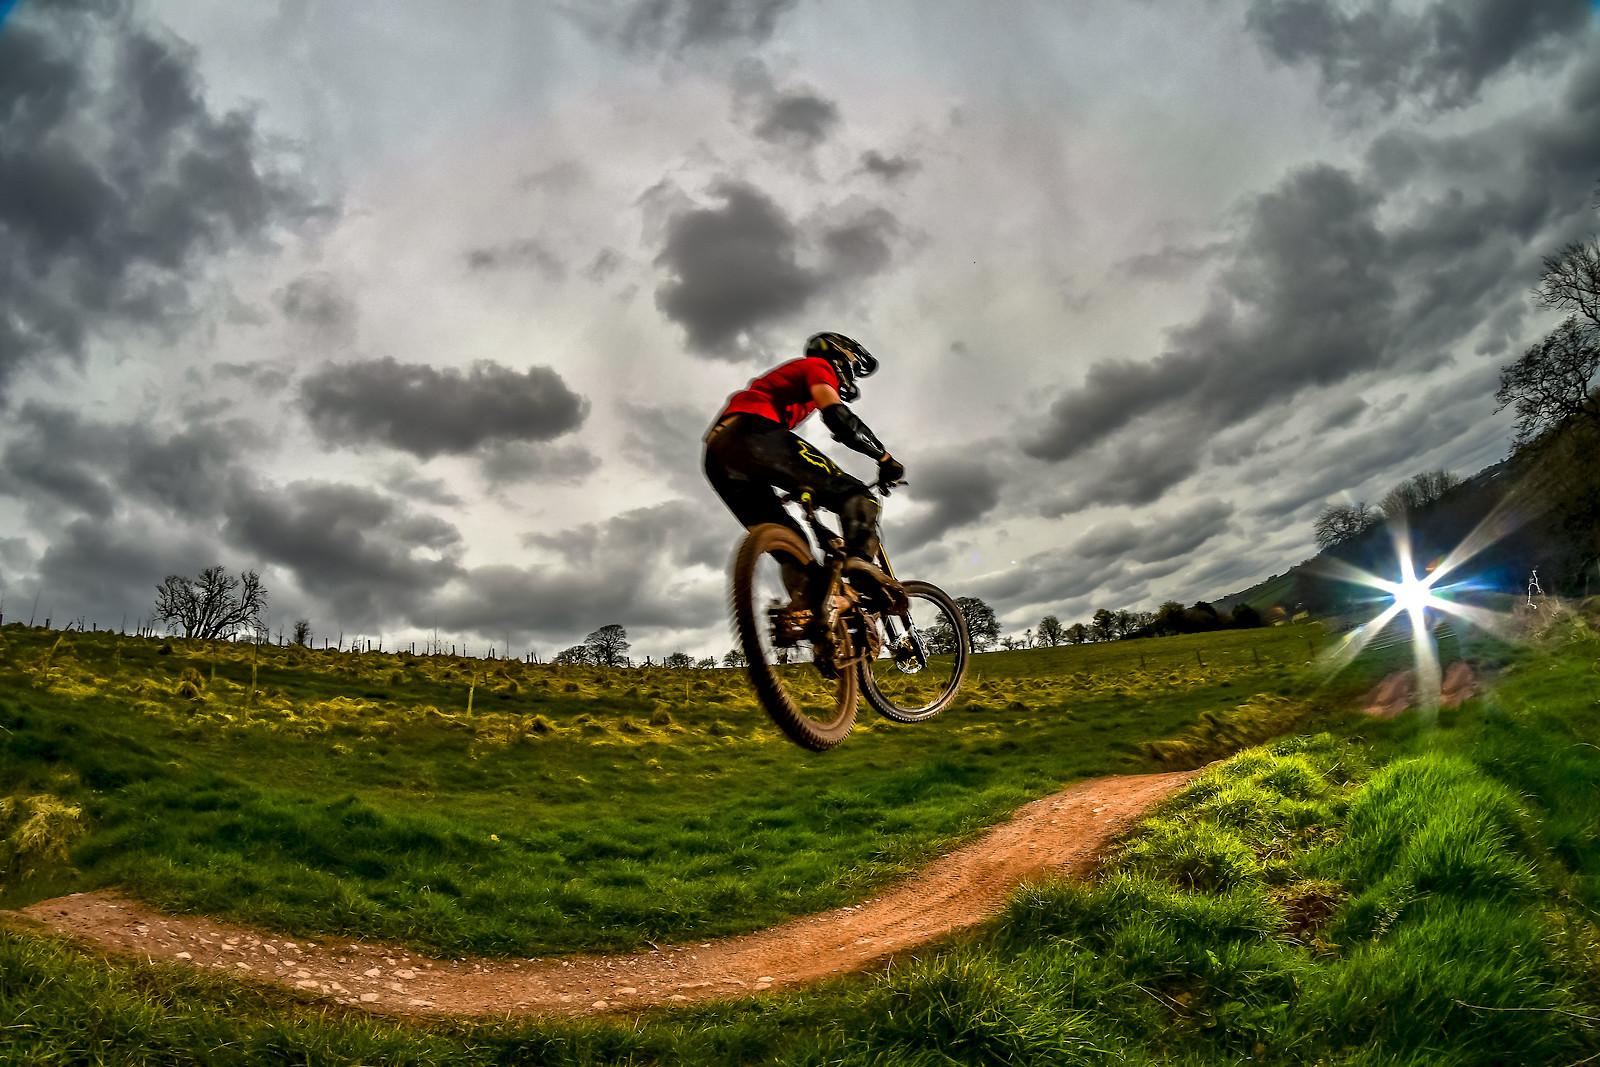 ROB1907 - robbarkerimages2017 - Mountain Biking Pictures - Vital MTB